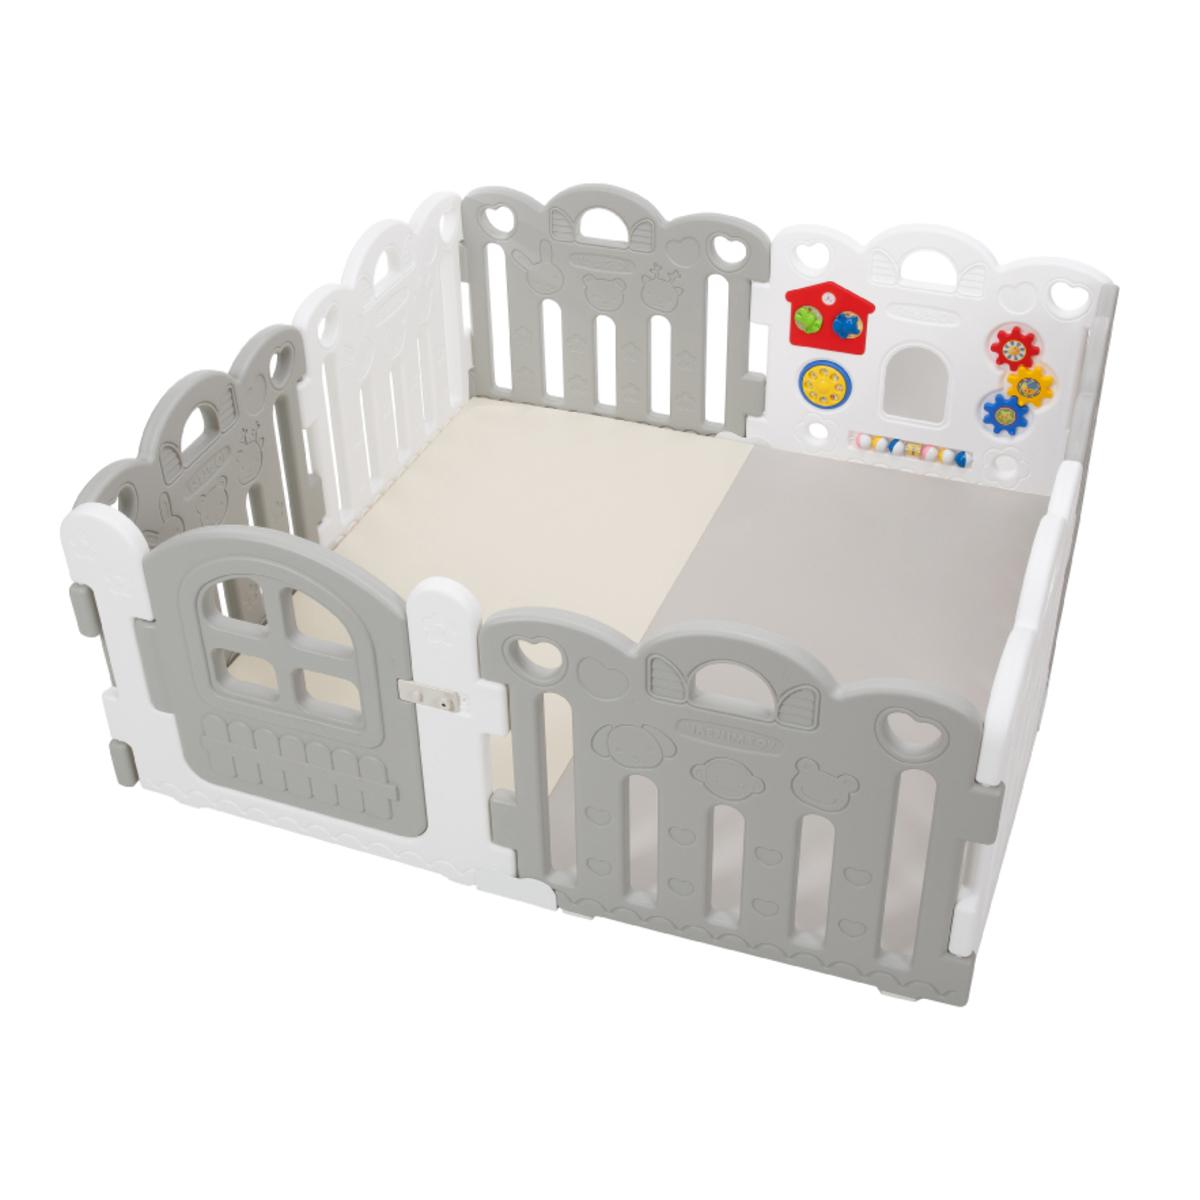 Haenim Toy Petit 8塊寶寶屋地墊套裝 - 灰 / 白